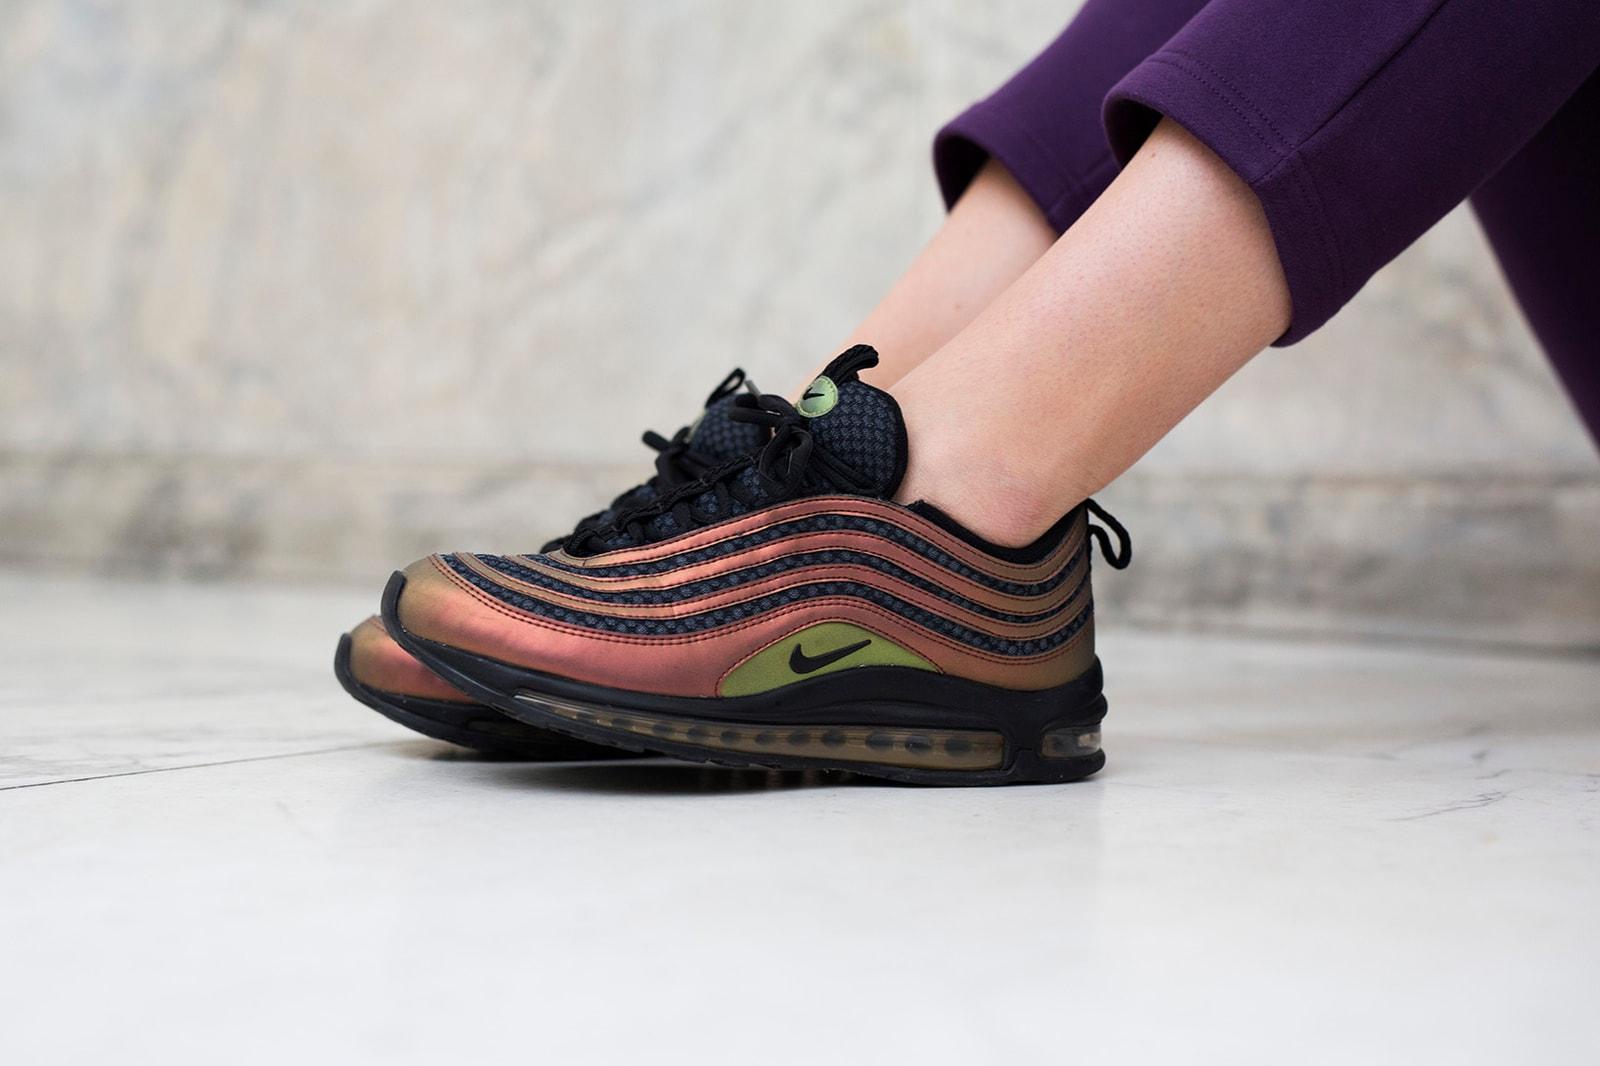 Sanne Poeze Girl on Kicks Amsterdam Netherlands Dutch Sneaker Blogger Collector Interview